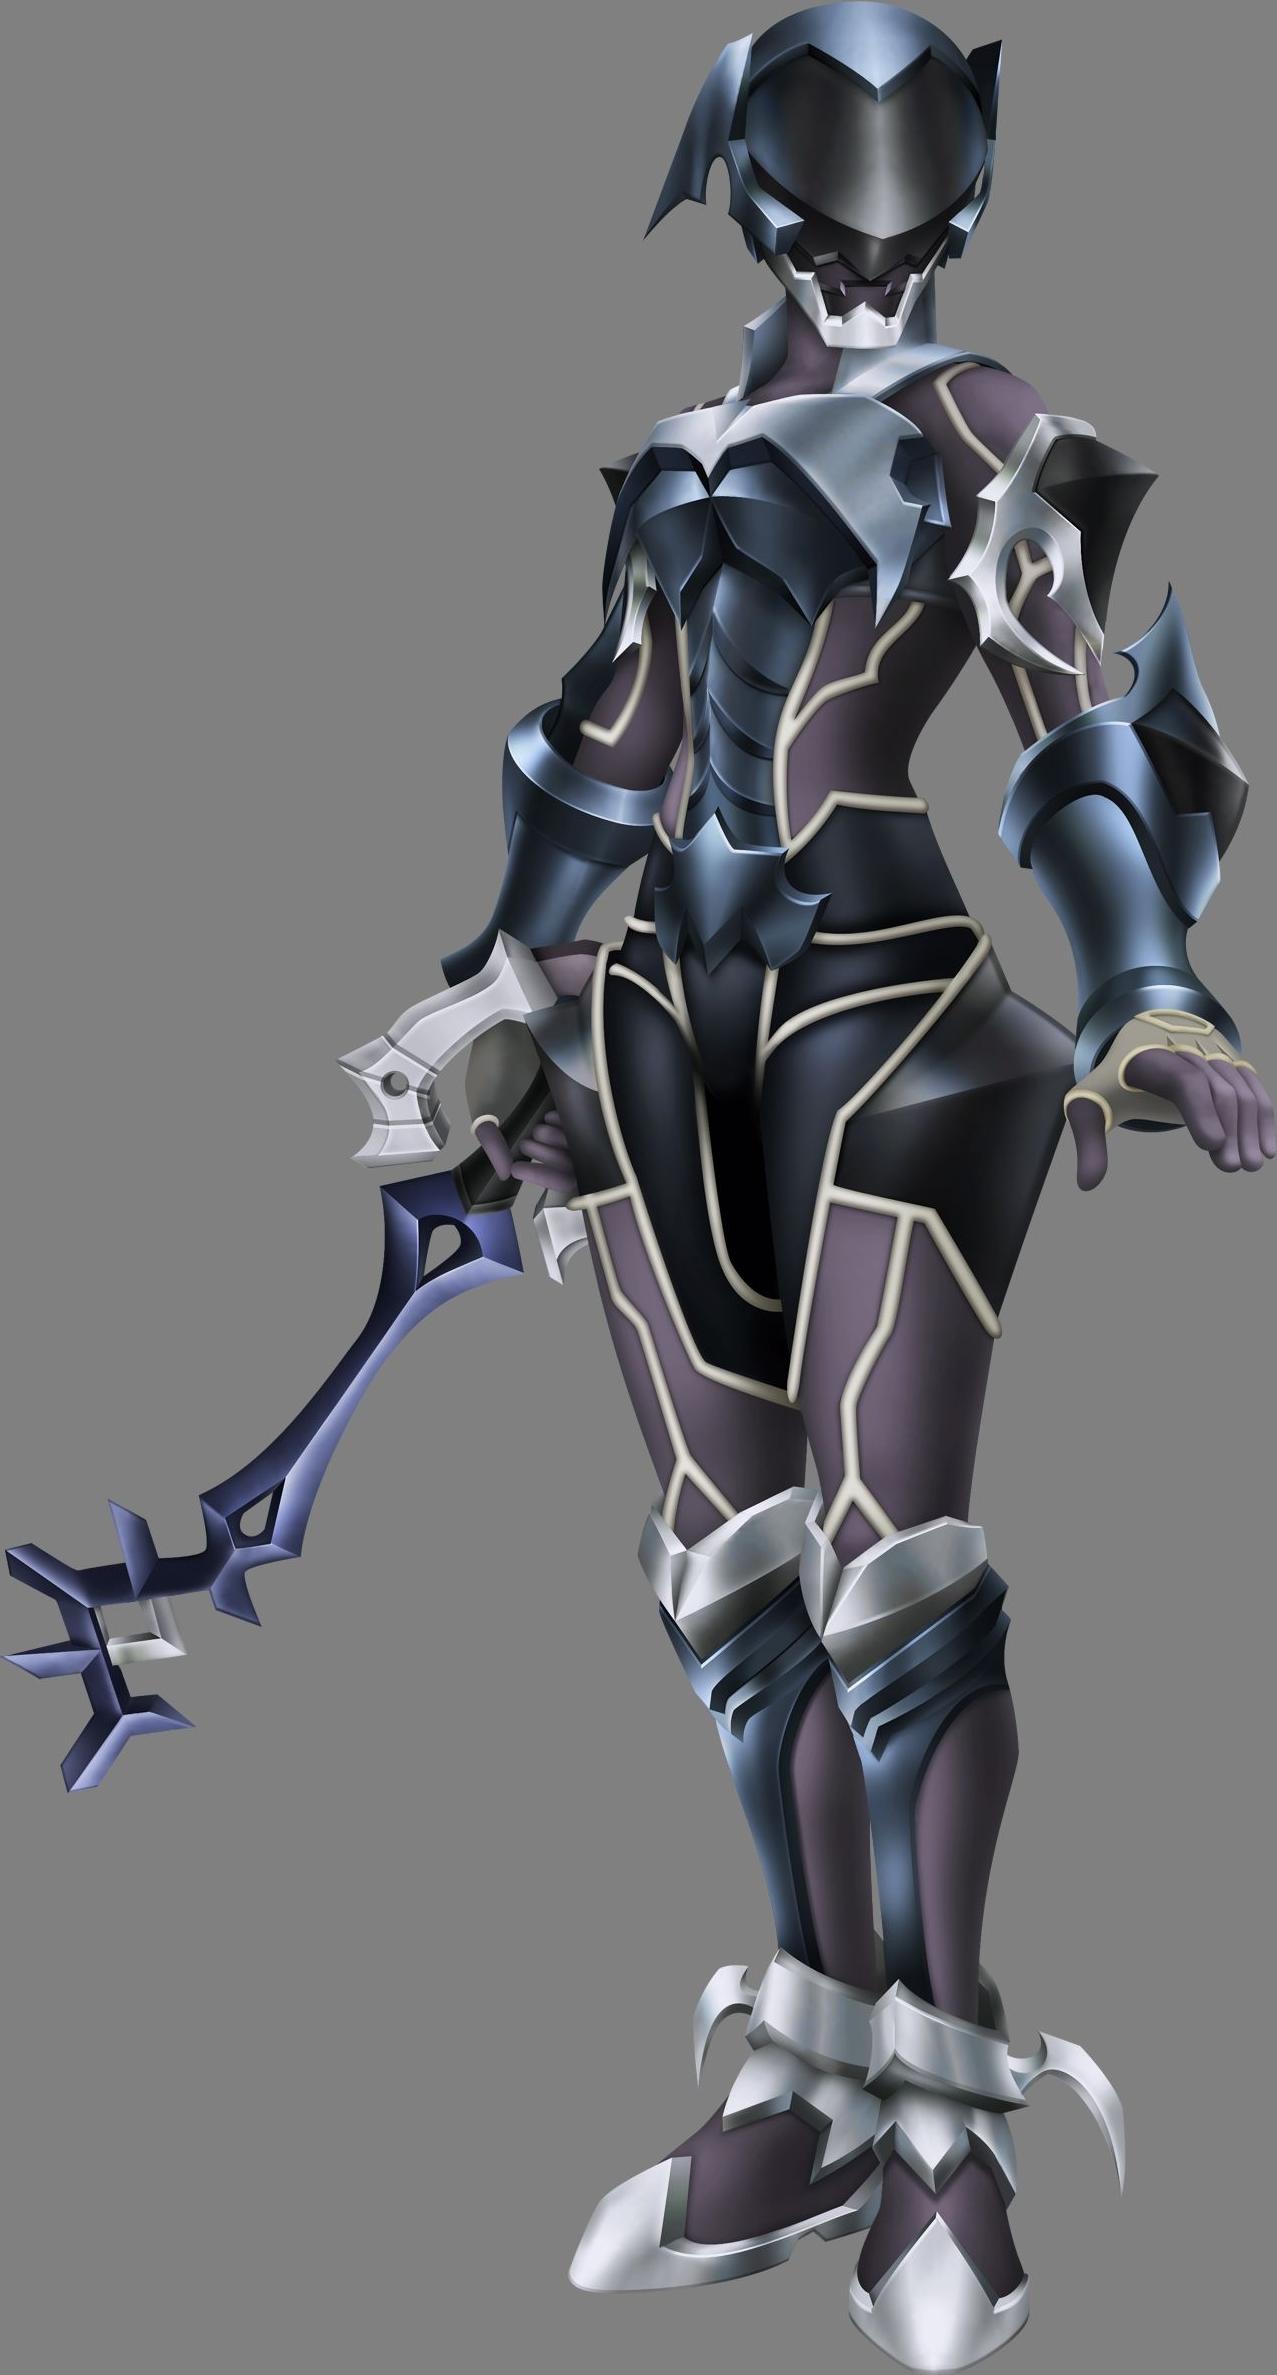 Kingdom Hearts/Kingdom Hearts 2 Keyblade Weapons - Skyrim ...